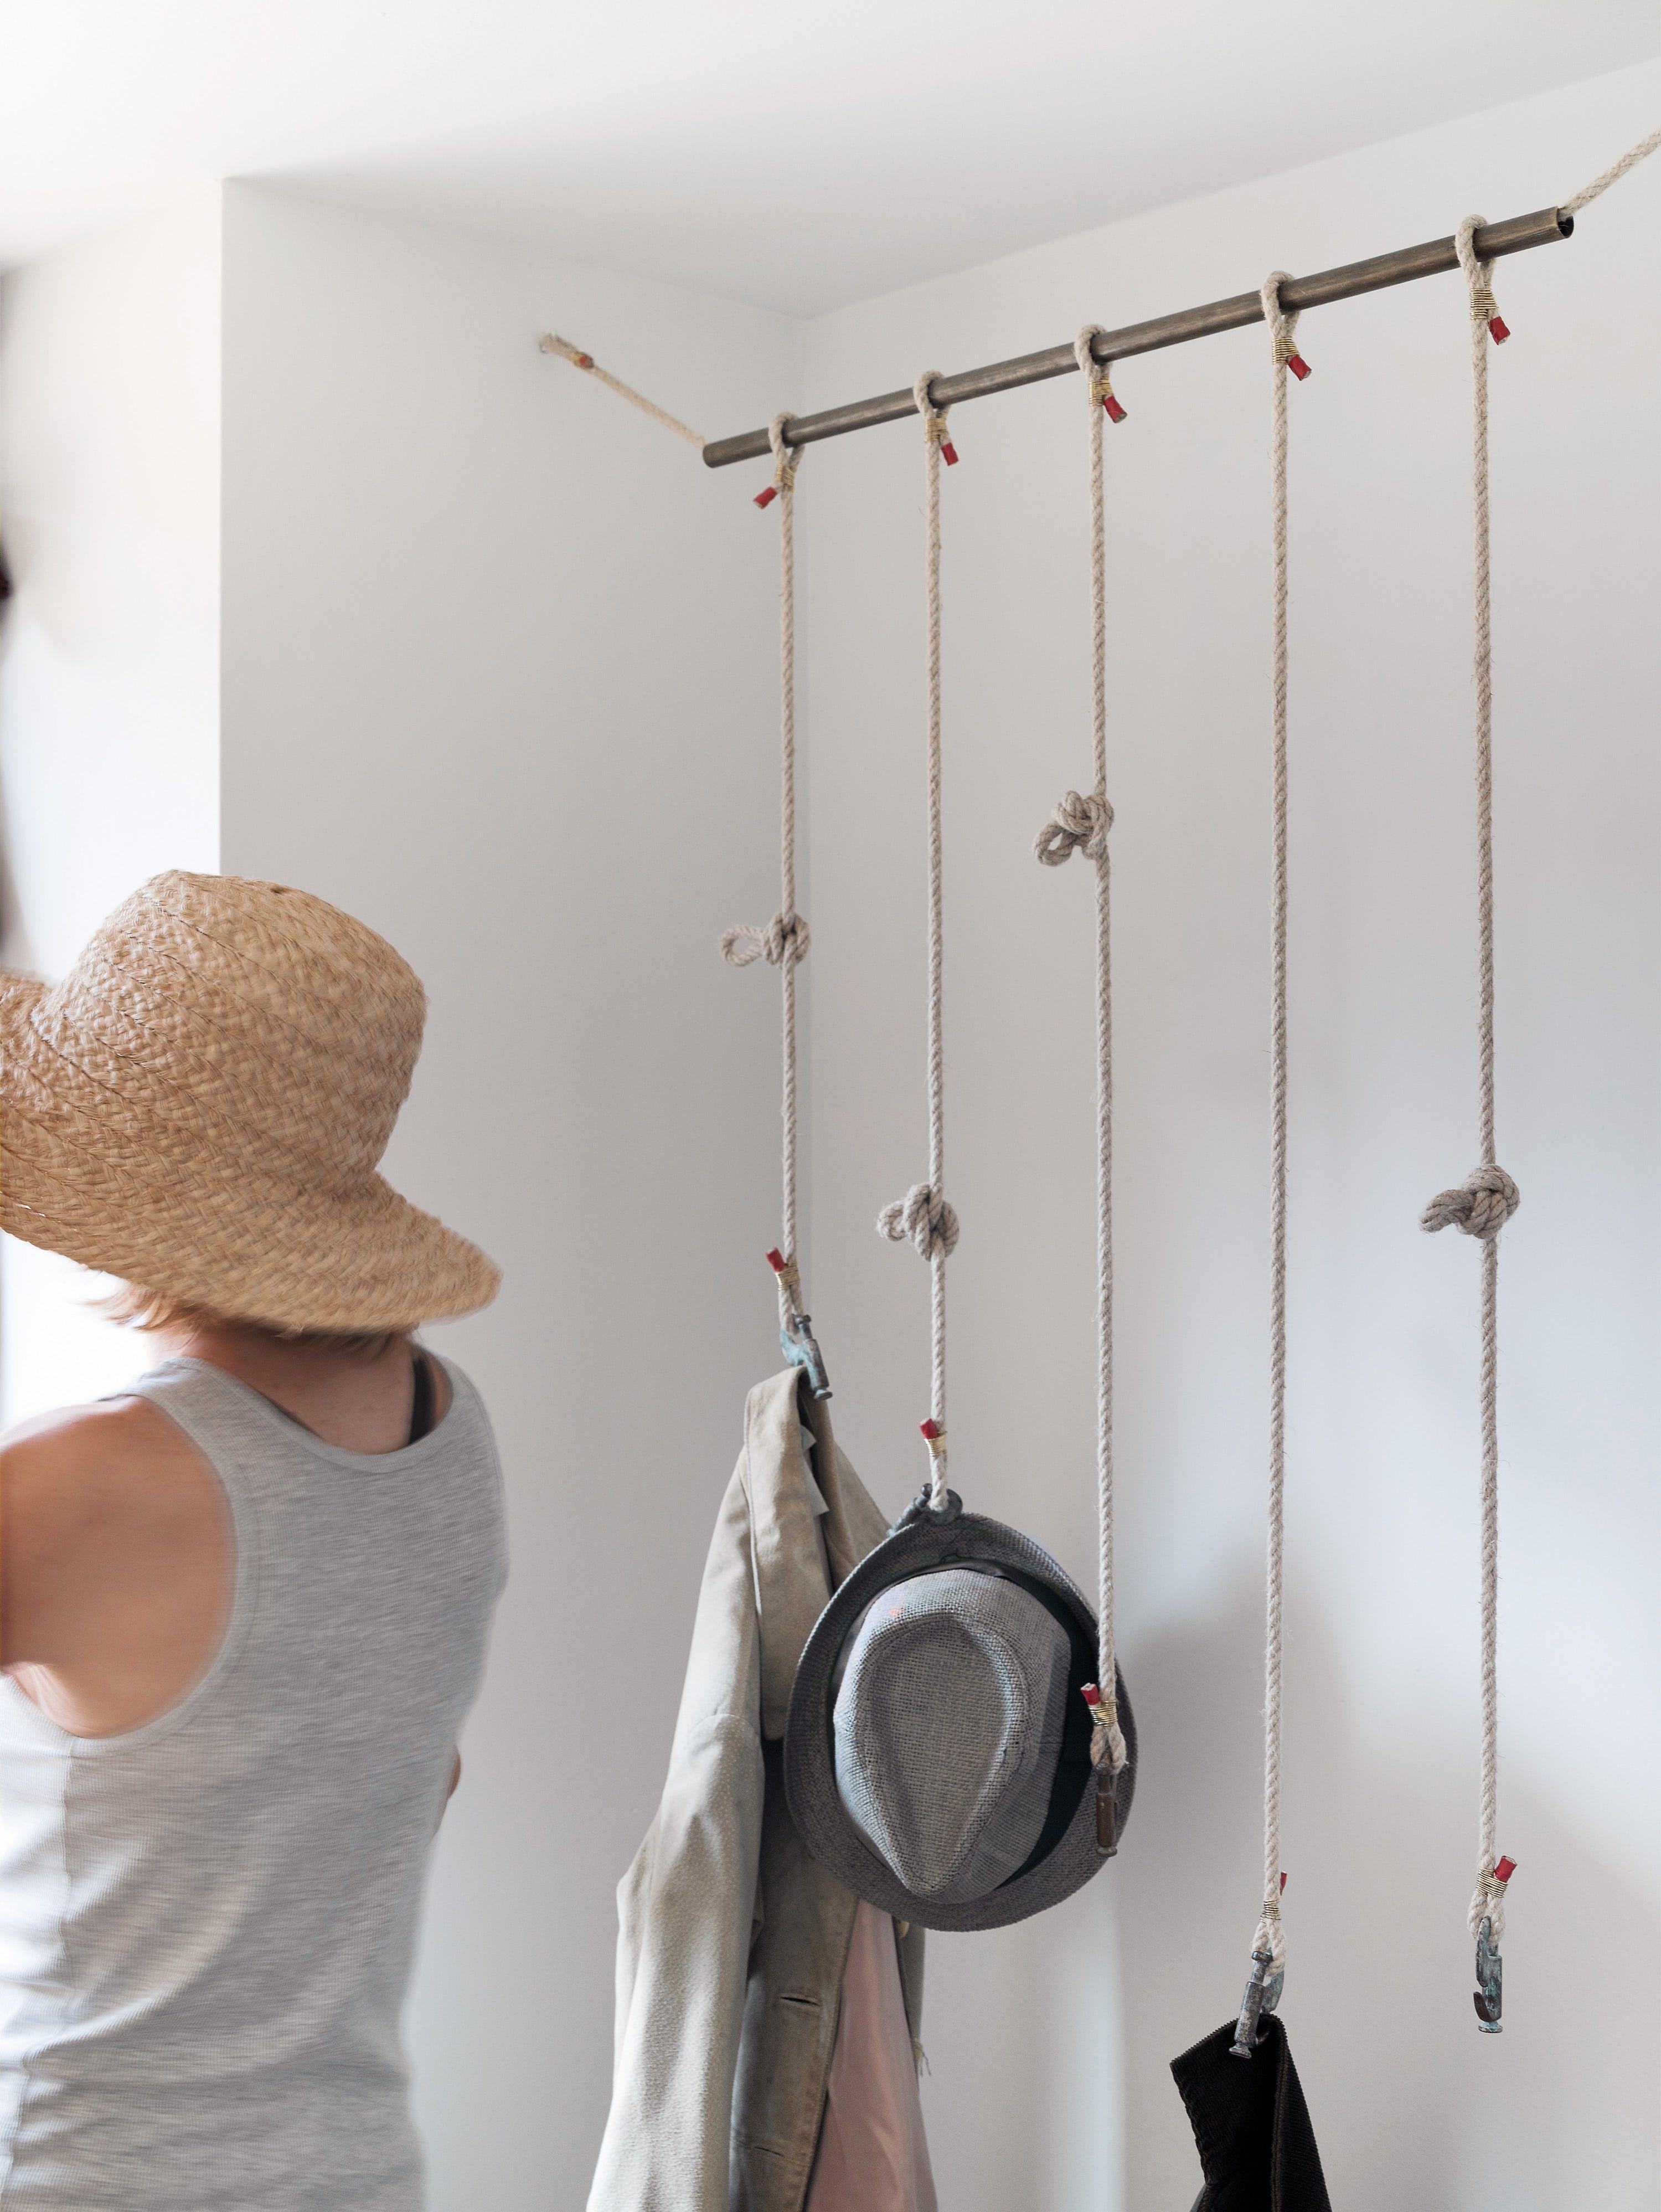 Shop Garrucho Hanger On Crowdyhouse Diy Hat Rack Home Diy Diy Projects